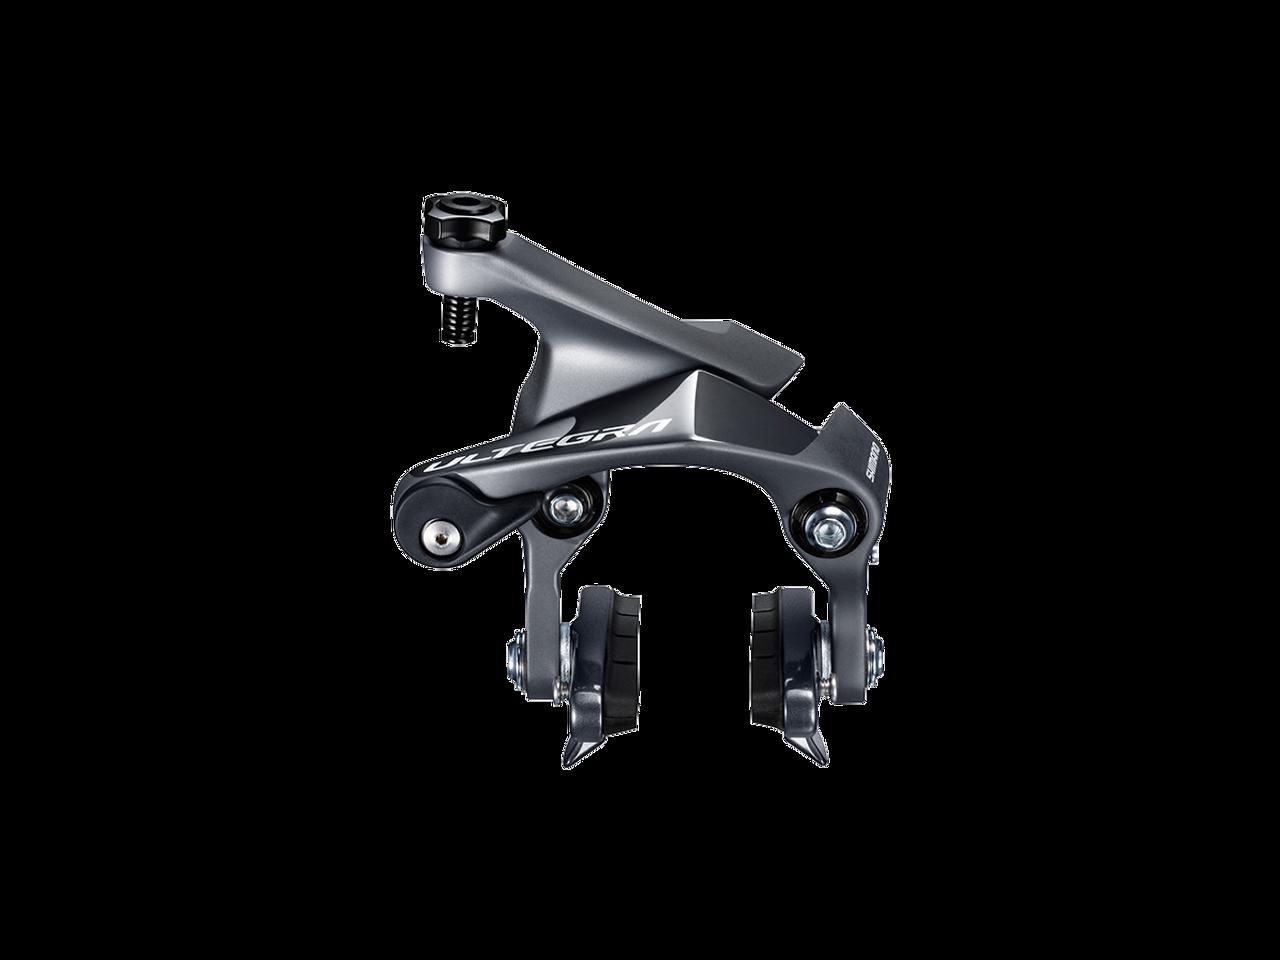 d8a7893b173 Texas Cyclesport Shimano Ultegra R8010-F Front Direct Mount Brake Caliper BR-R8010-F  84.99 New